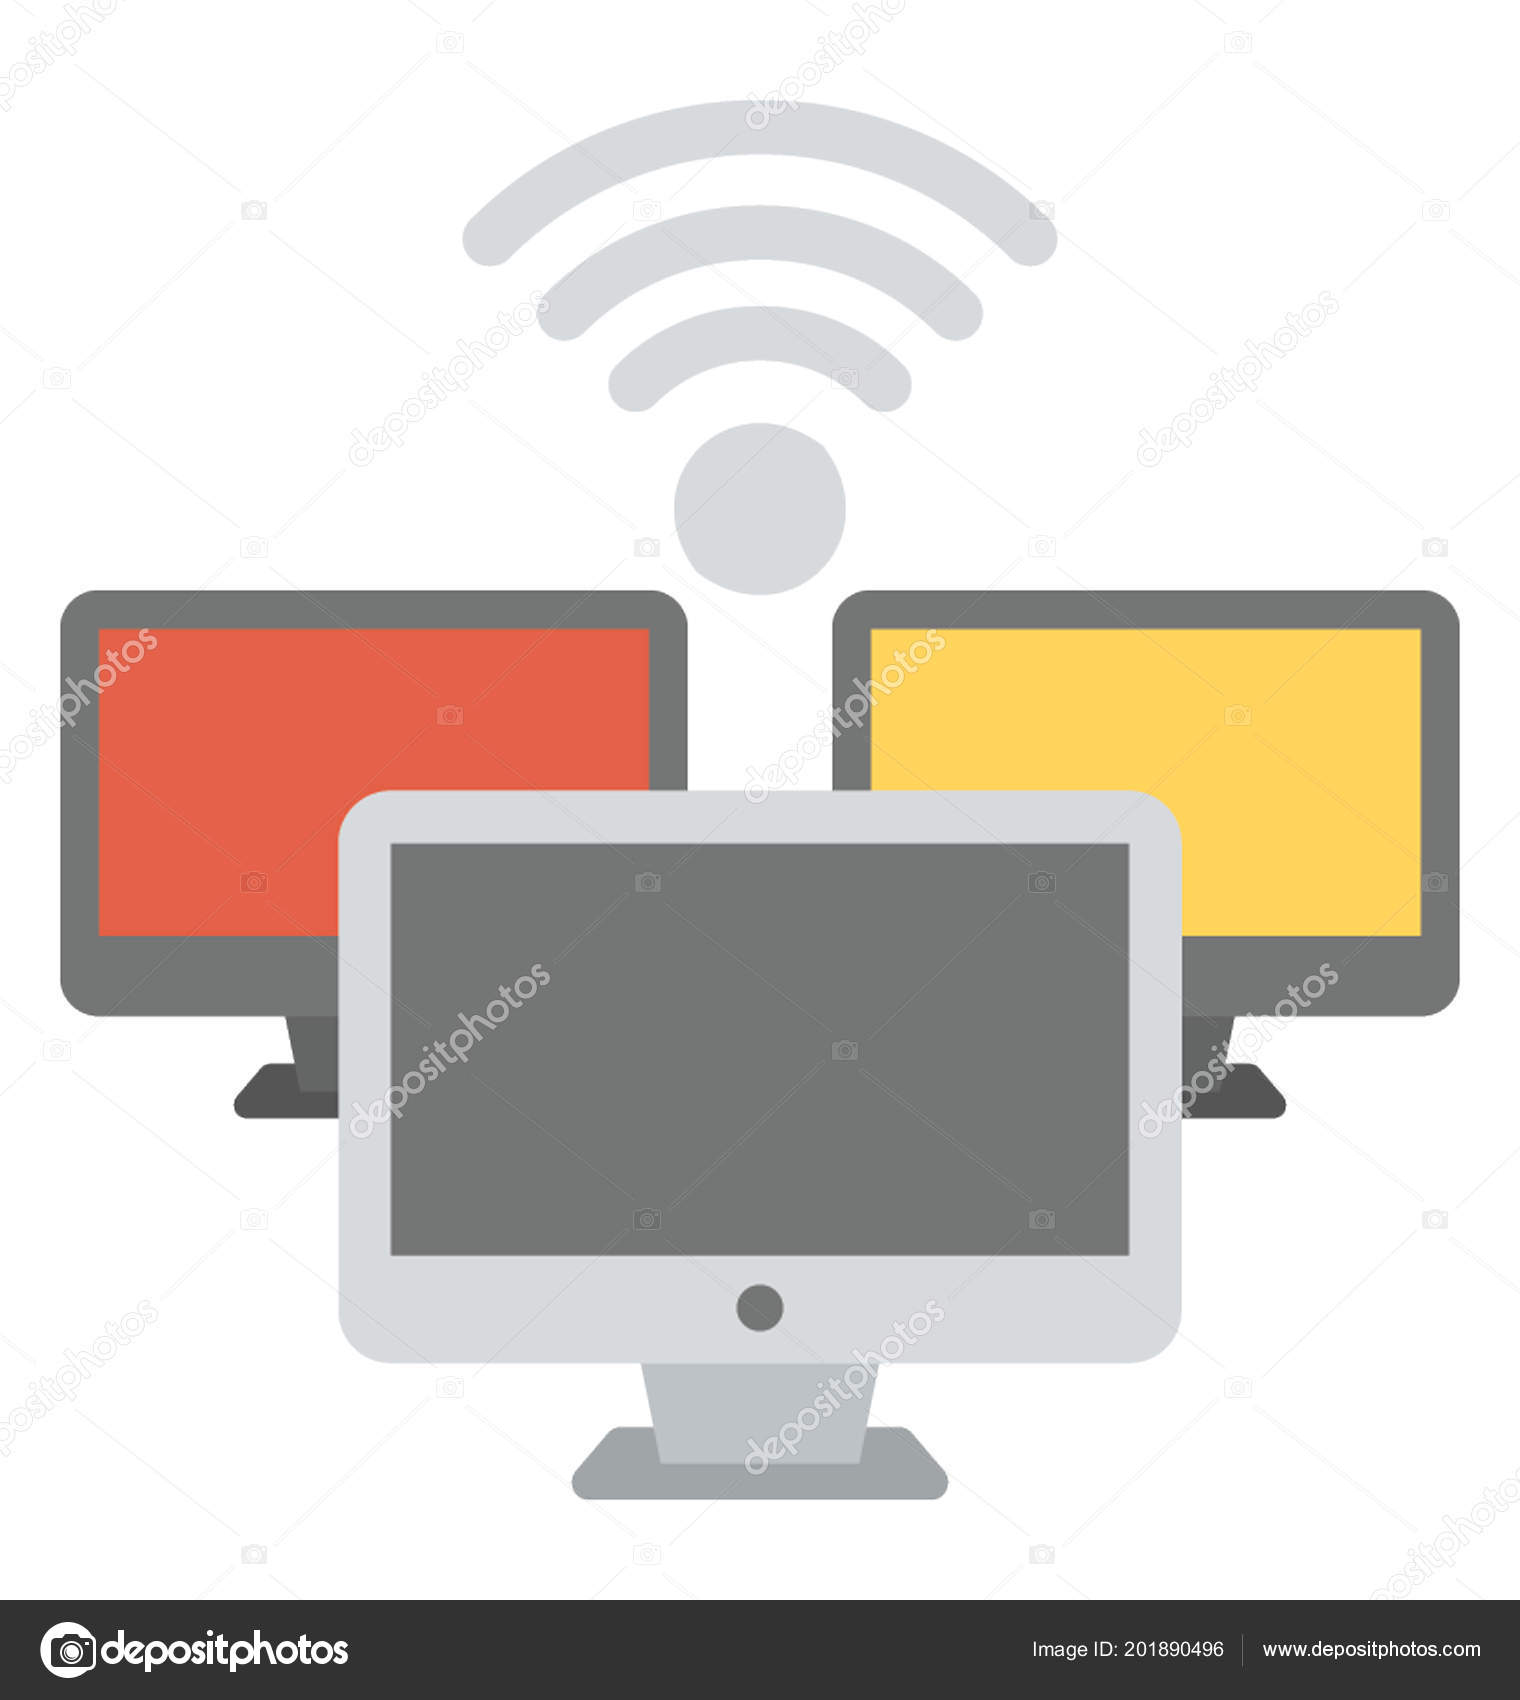 Magnificent Wifi Network Diagram Flat Icon Stock Vector C Vectorsmarket 201890496 Wiring Digital Resources Helishebarightsorg